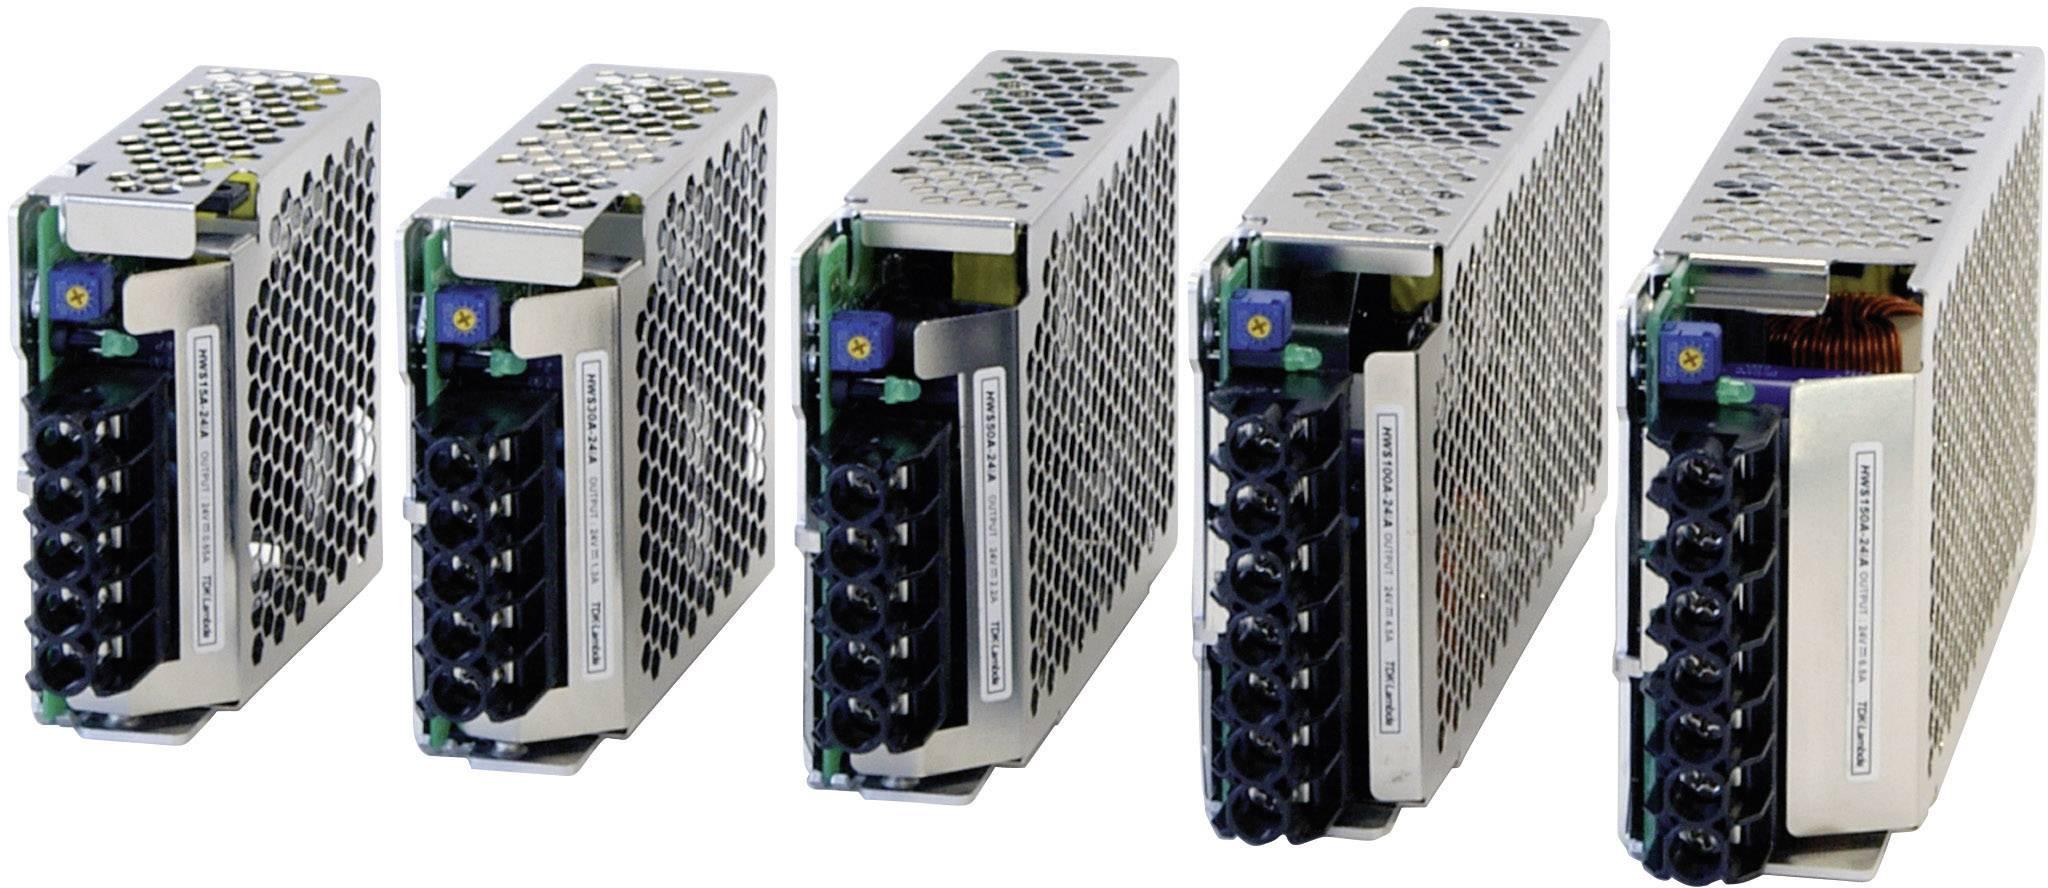 Zabudovateľný napájací zdroj TDK-Lambda HWS-100A-12, 12 V, 102 W